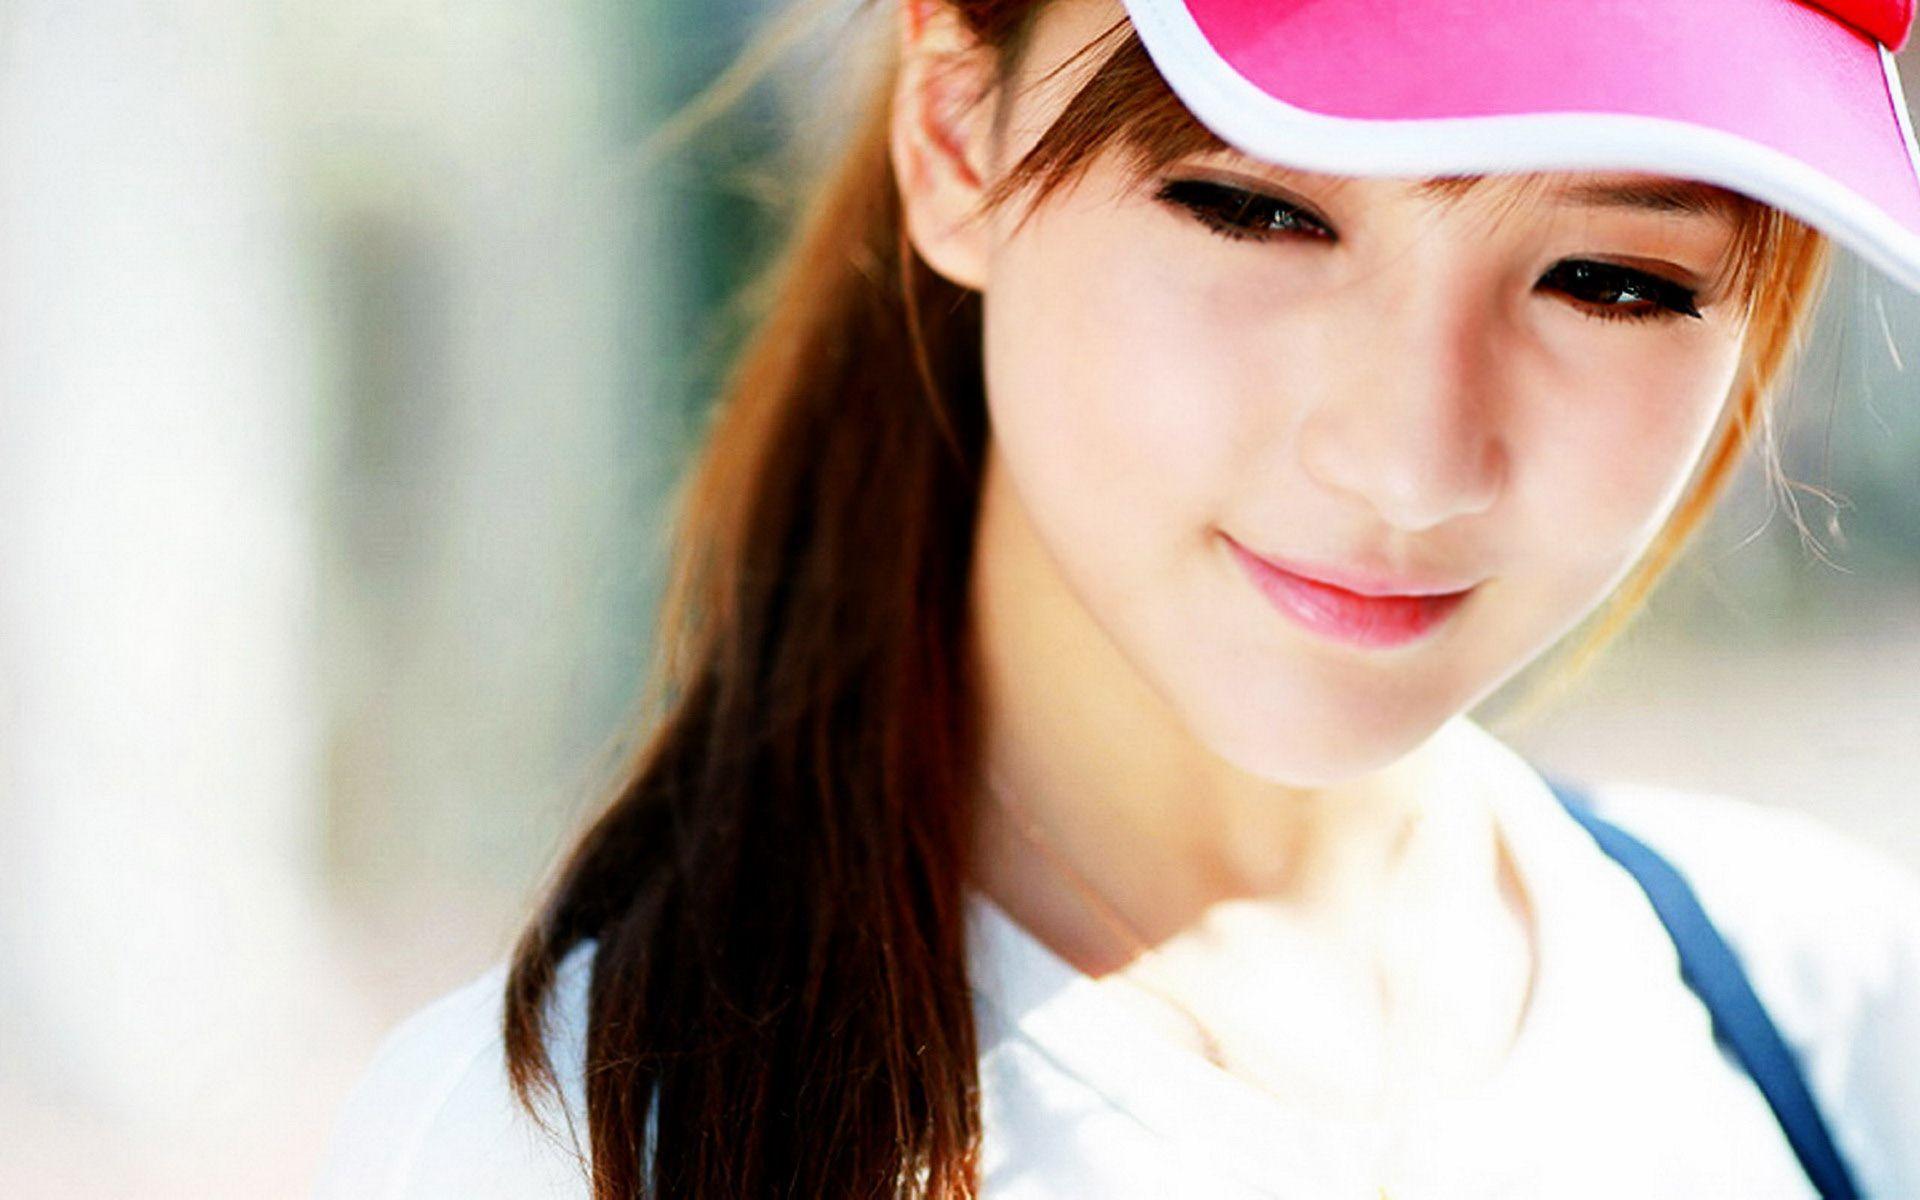 A Cute Girl Hd Wallpaper Cute Girl Hd Wallpaper Beautiful Girl Wallpaper Cute Girl Wallpaper